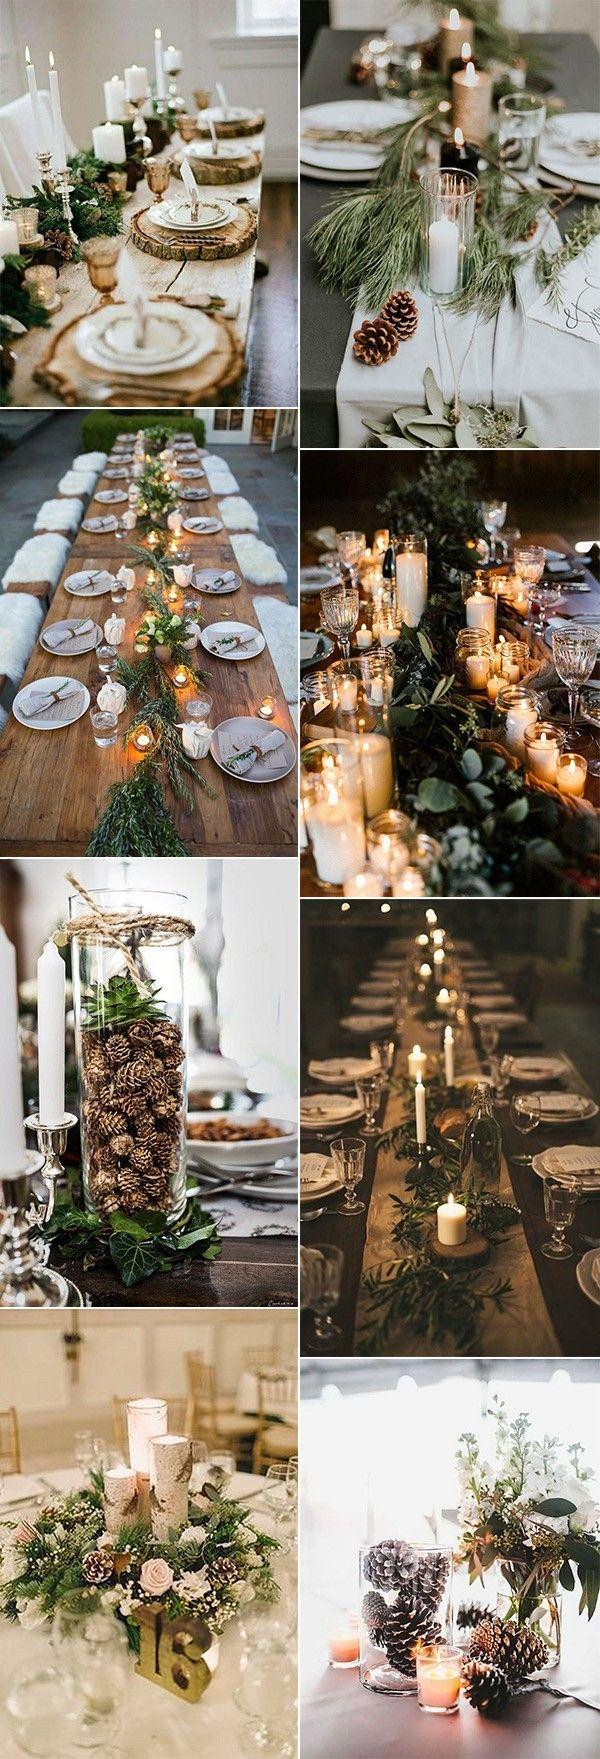 Wedding decorations with flowers november 2018  Whimsical Winter Wonderland Wedding Centerpieces  November